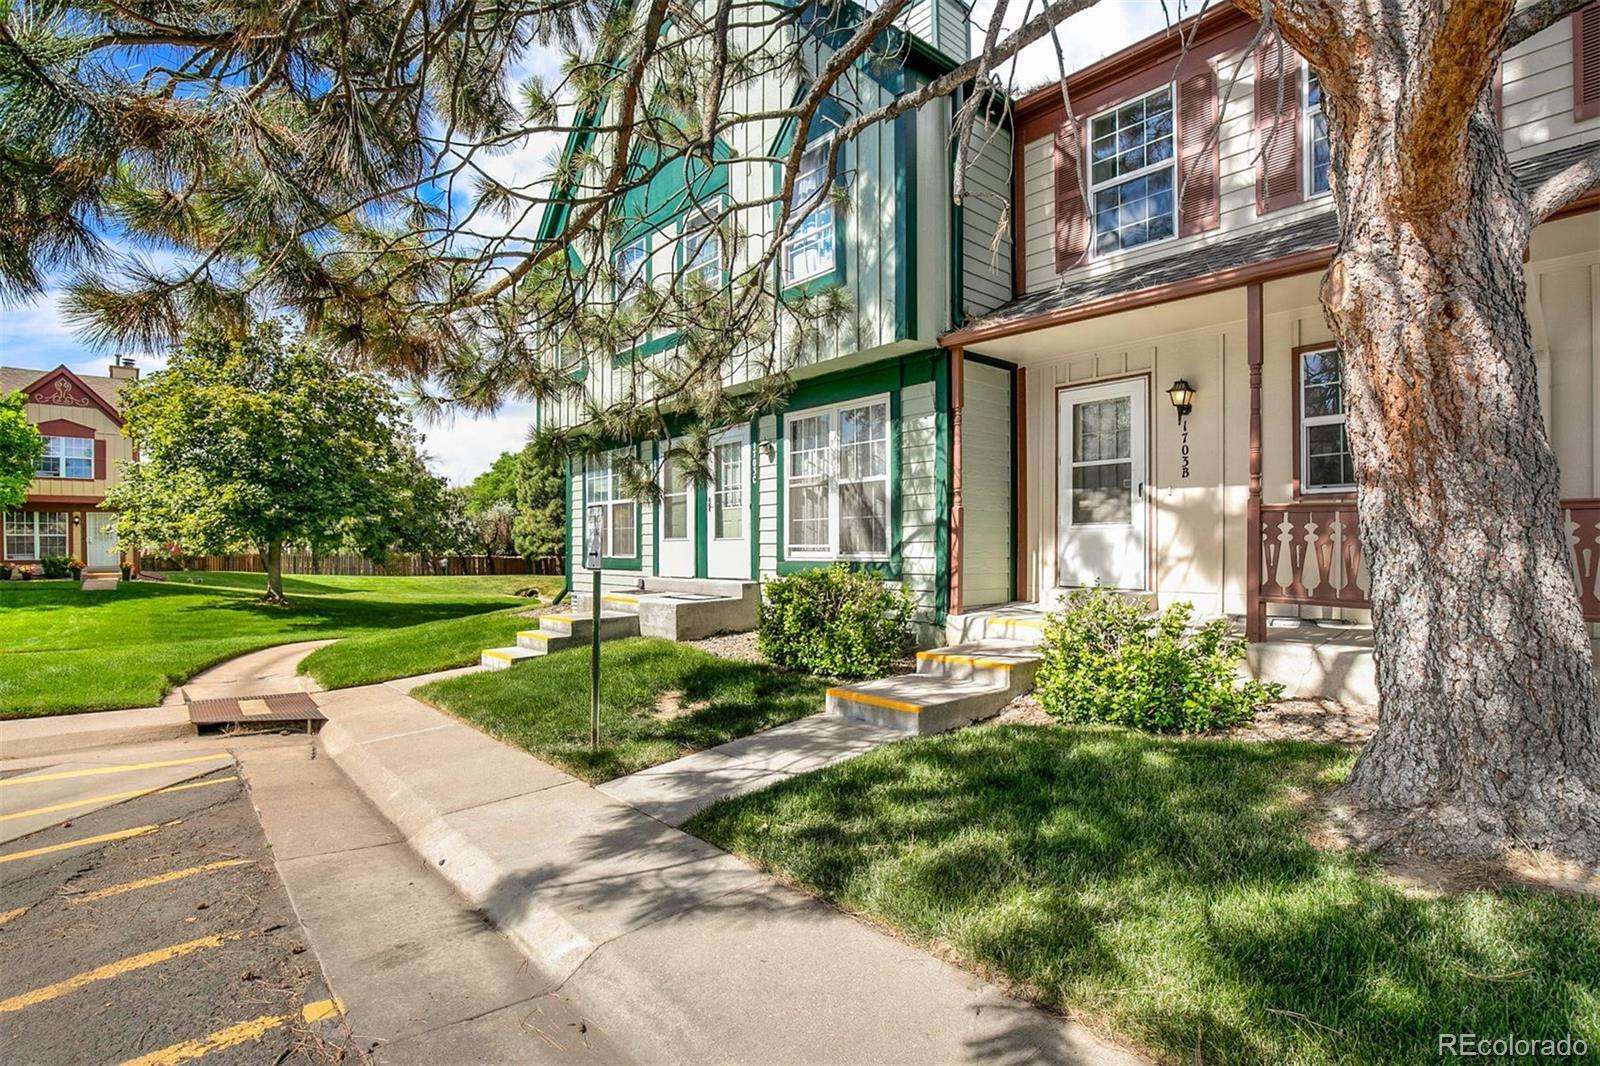 1703 S Blackhawk Way #B Property Photo - Aurora, CO real estate listing